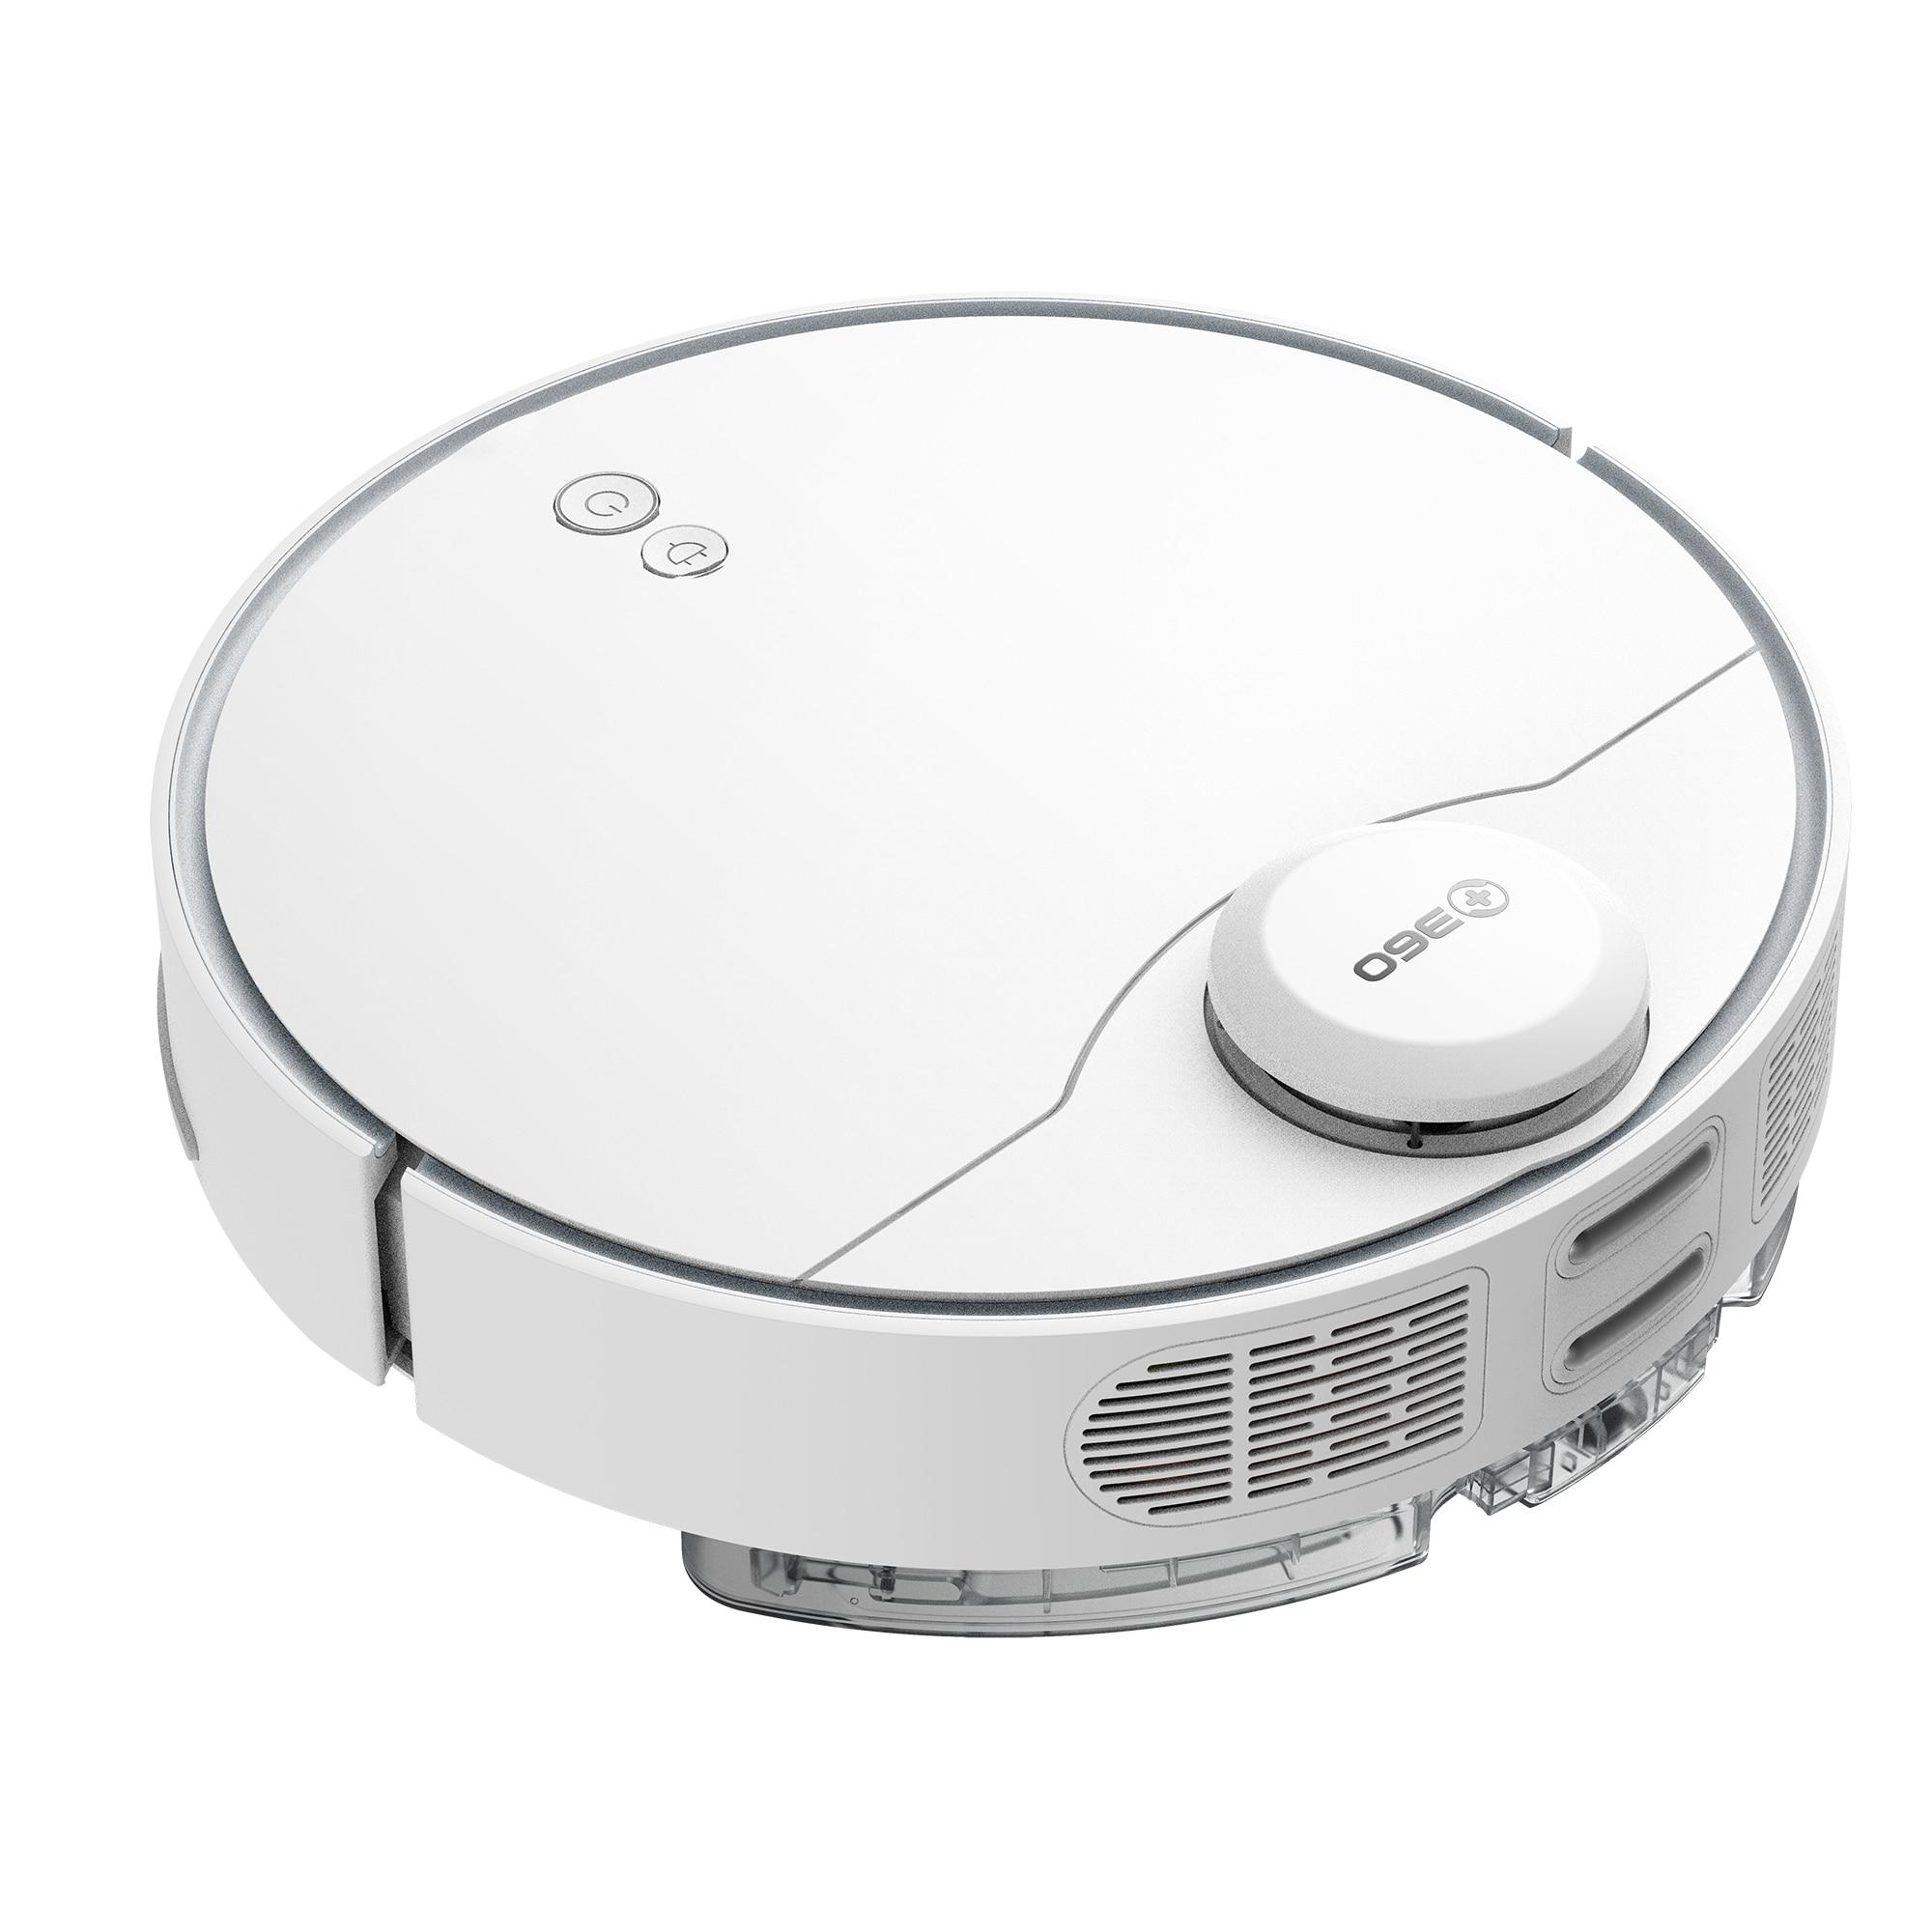 Fotografie Robot de aspirare 360 S9 , Mop, WiFi, Navigatie laser LSD, Bariere virtuale, Senzor anti-cadere , Google Assistant & Alexa, 35W, Baterie Li-ion, 5200mAh, Timp de incarcare: 240 min, Alb